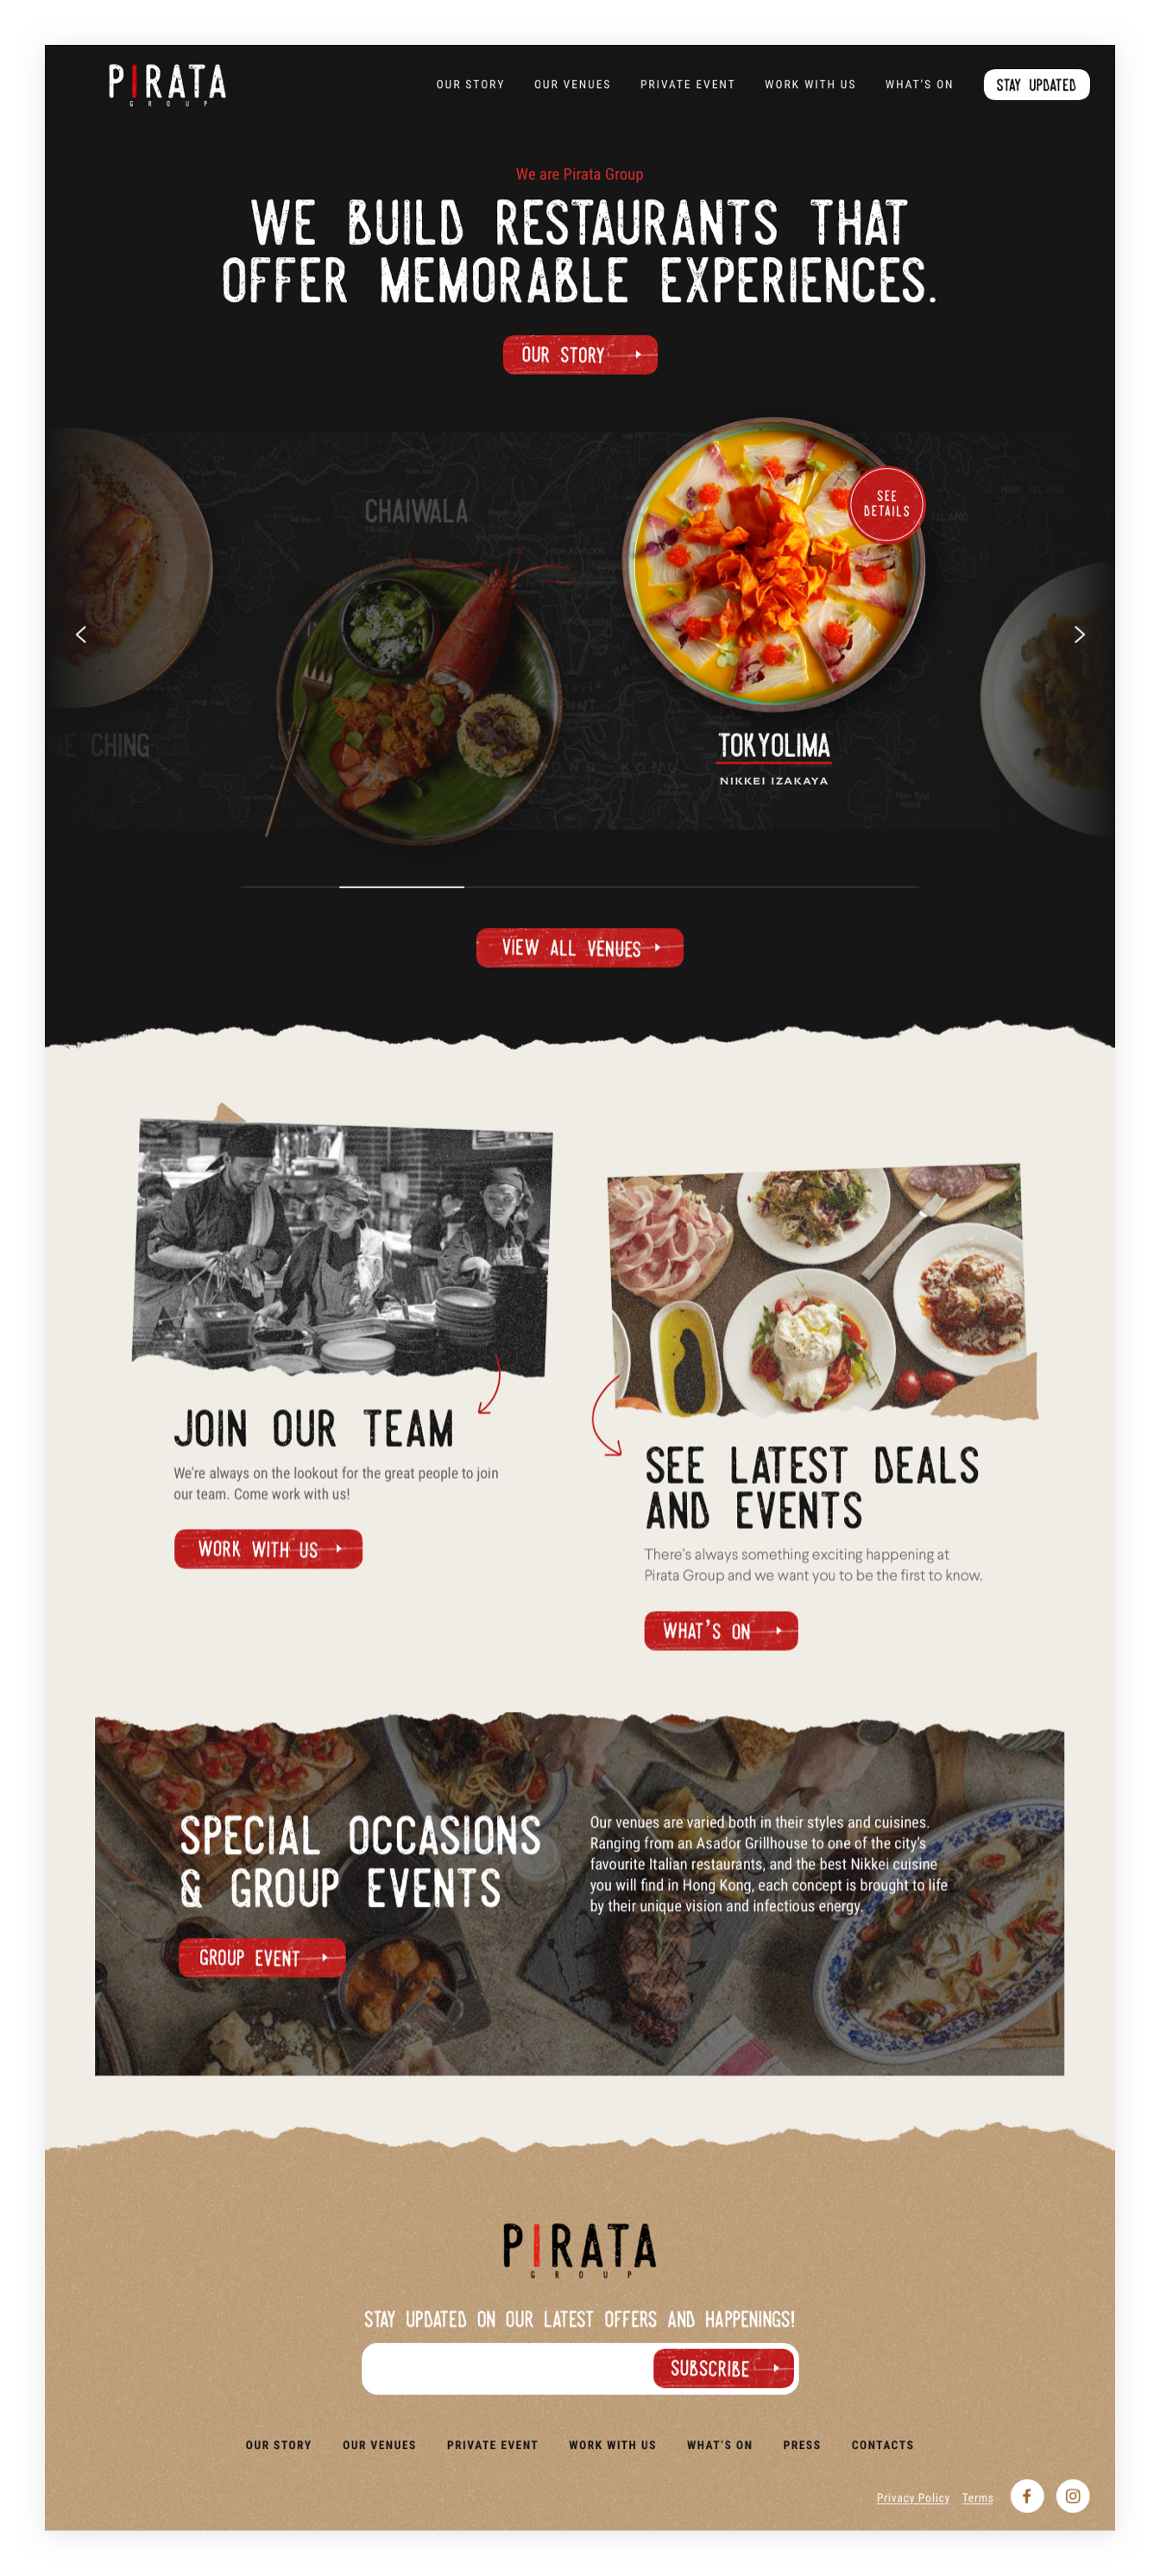 Pirata Group Site